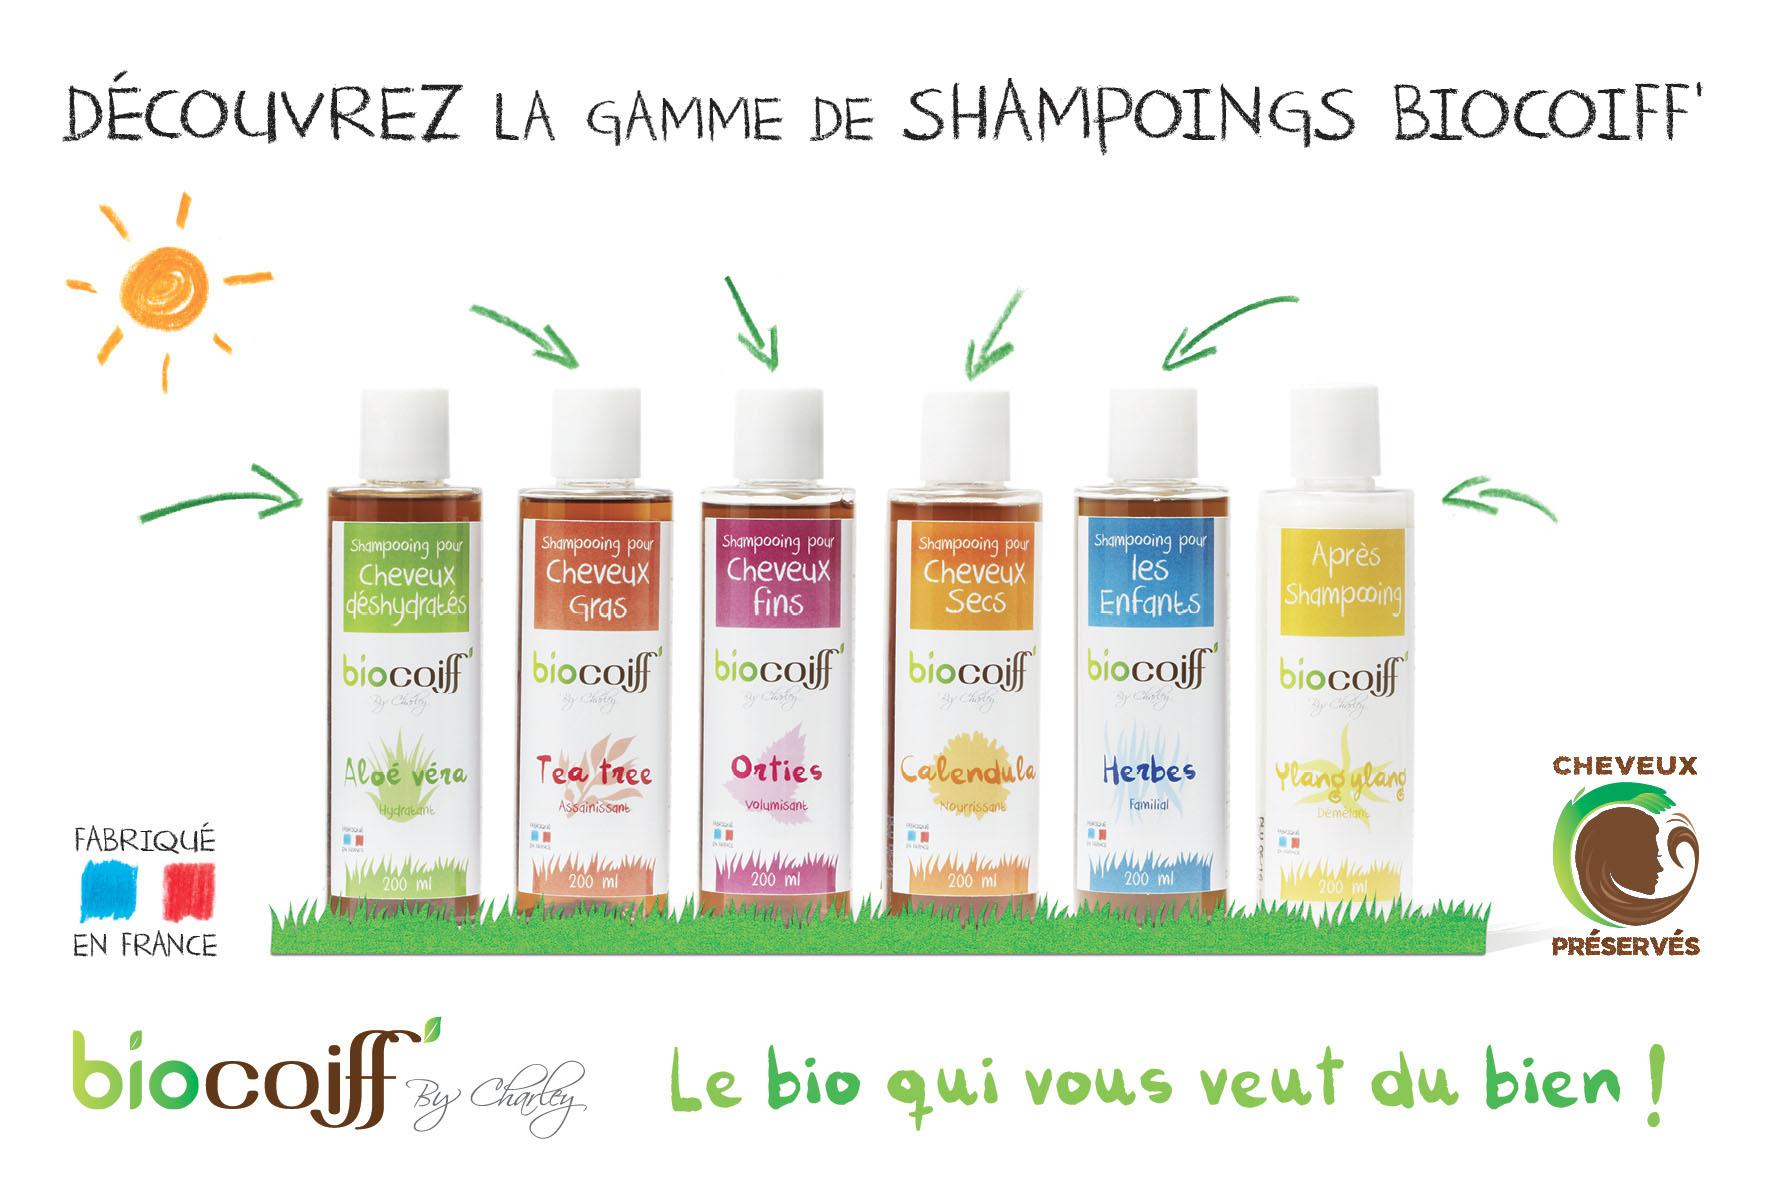 produits biocoiff